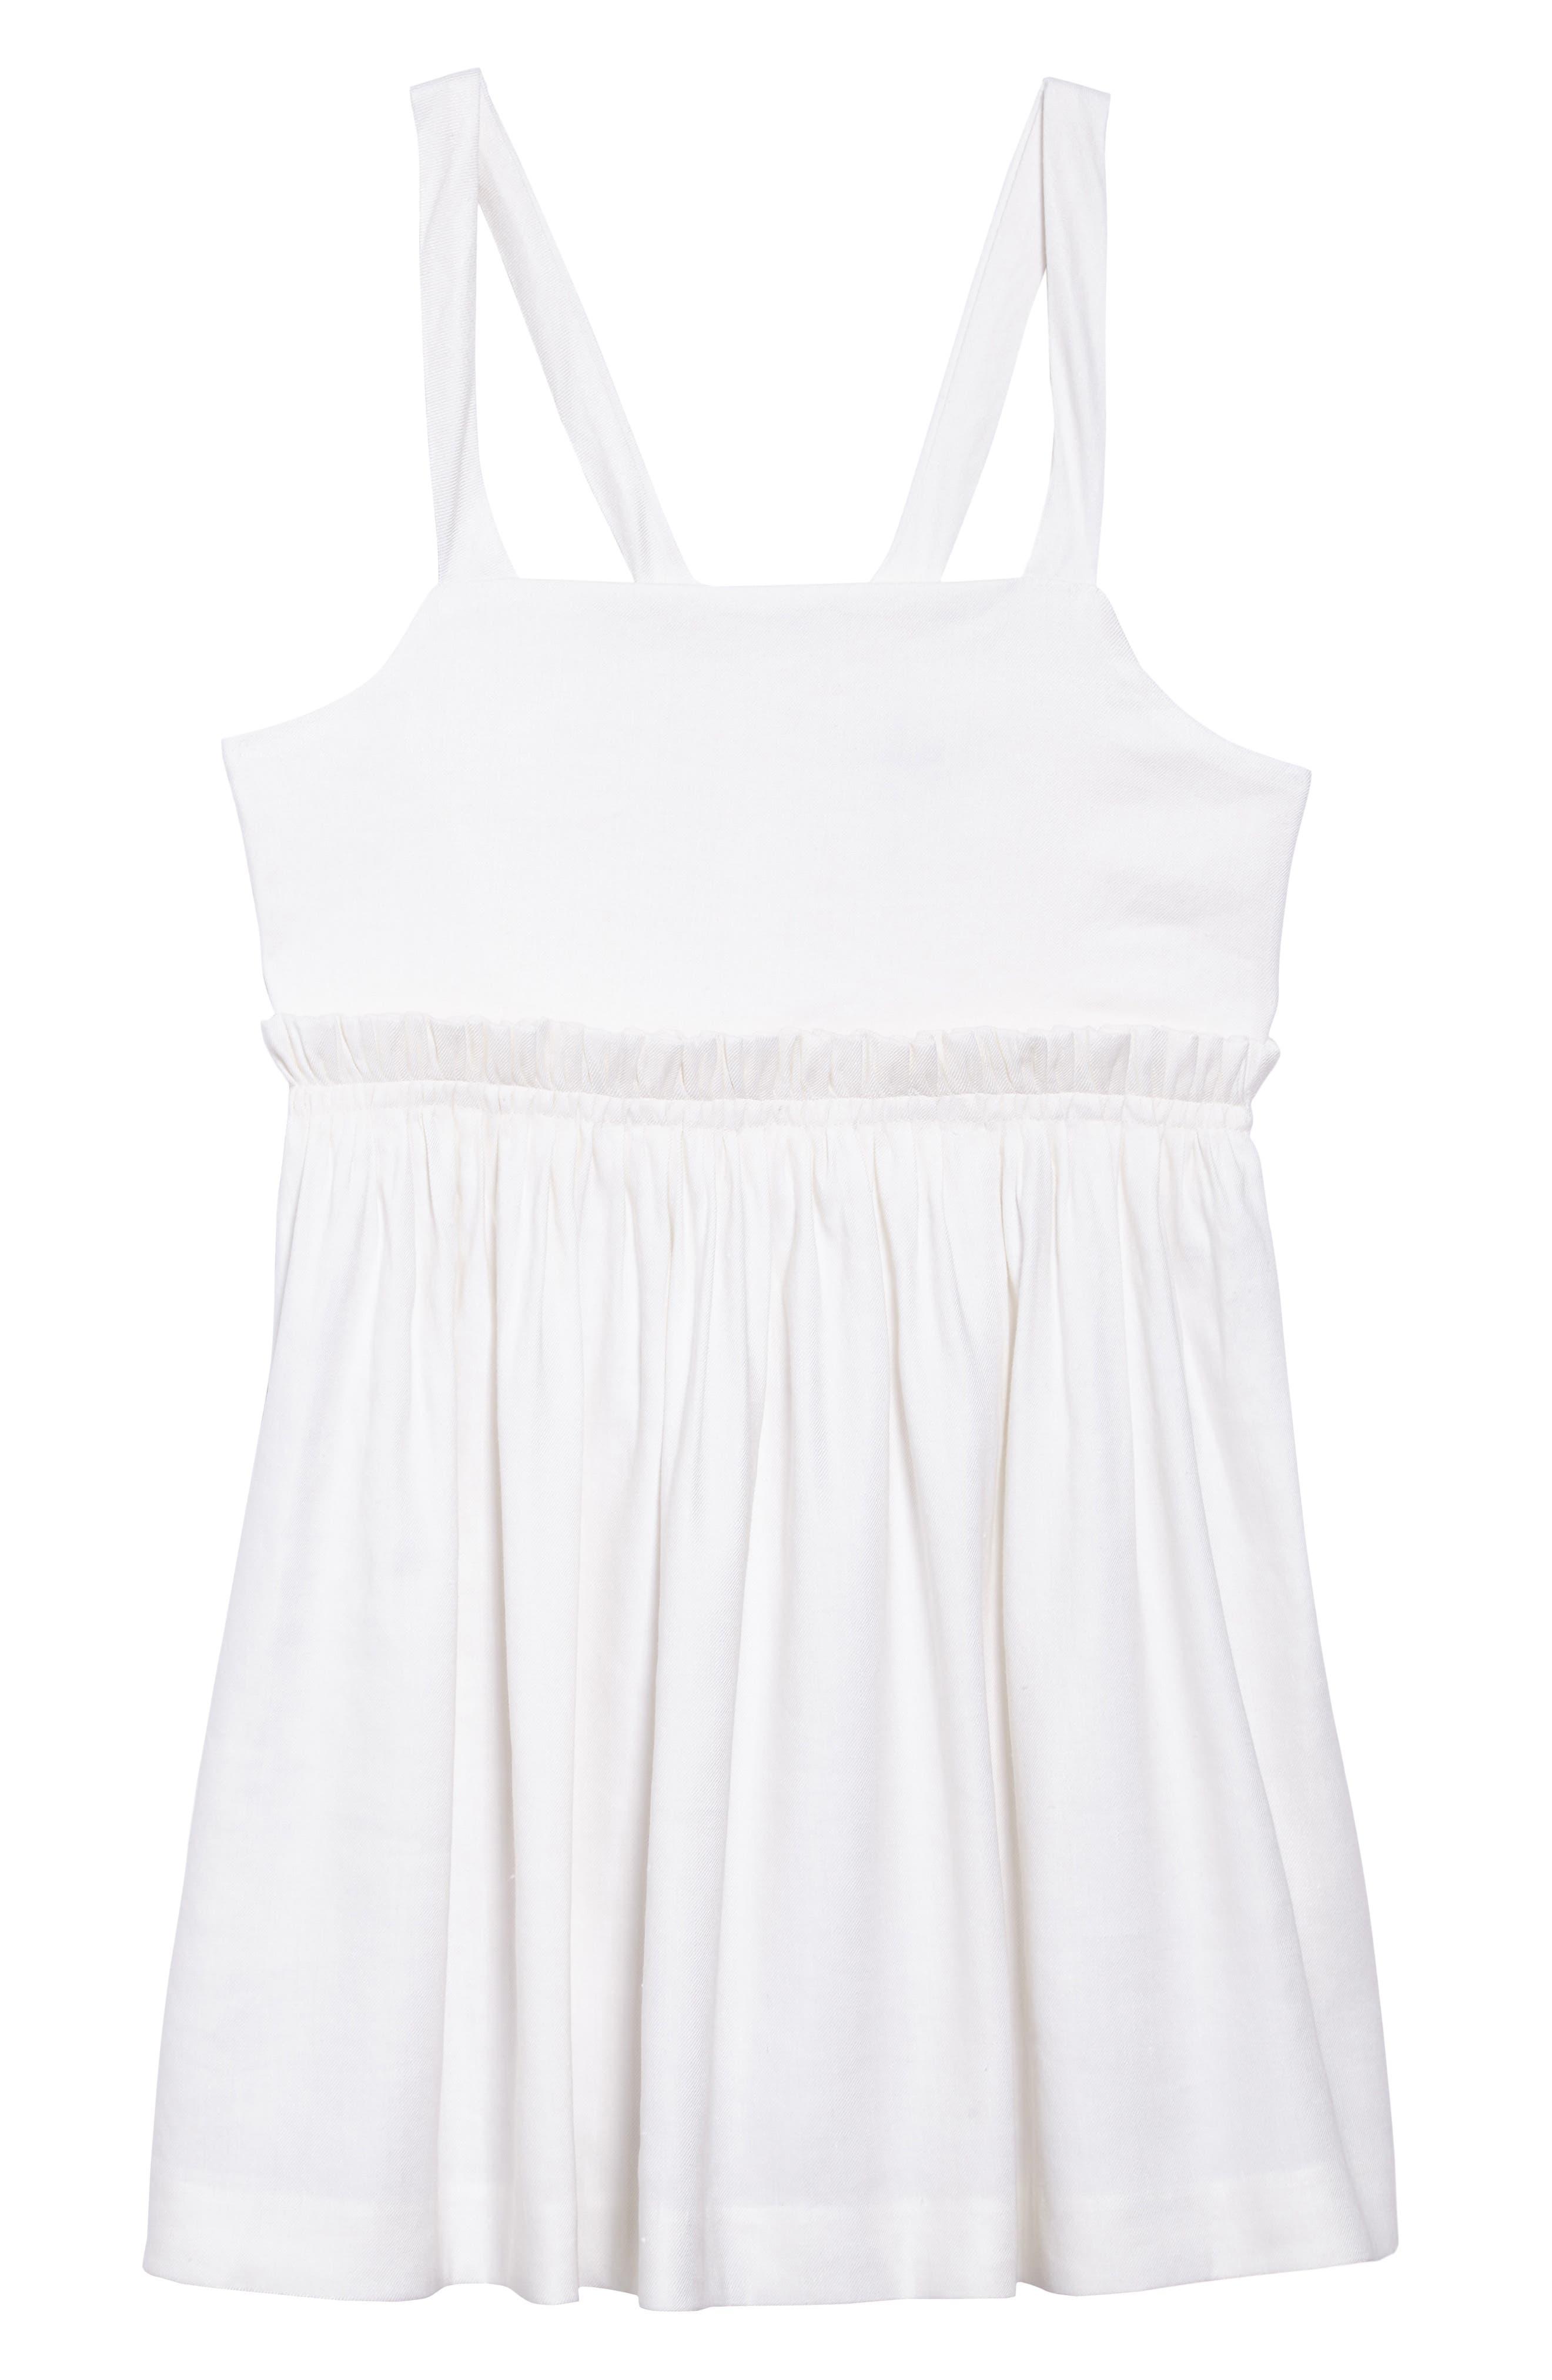 Jenny Linen Blend Dress,                             Main thumbnail 1, color,                             100